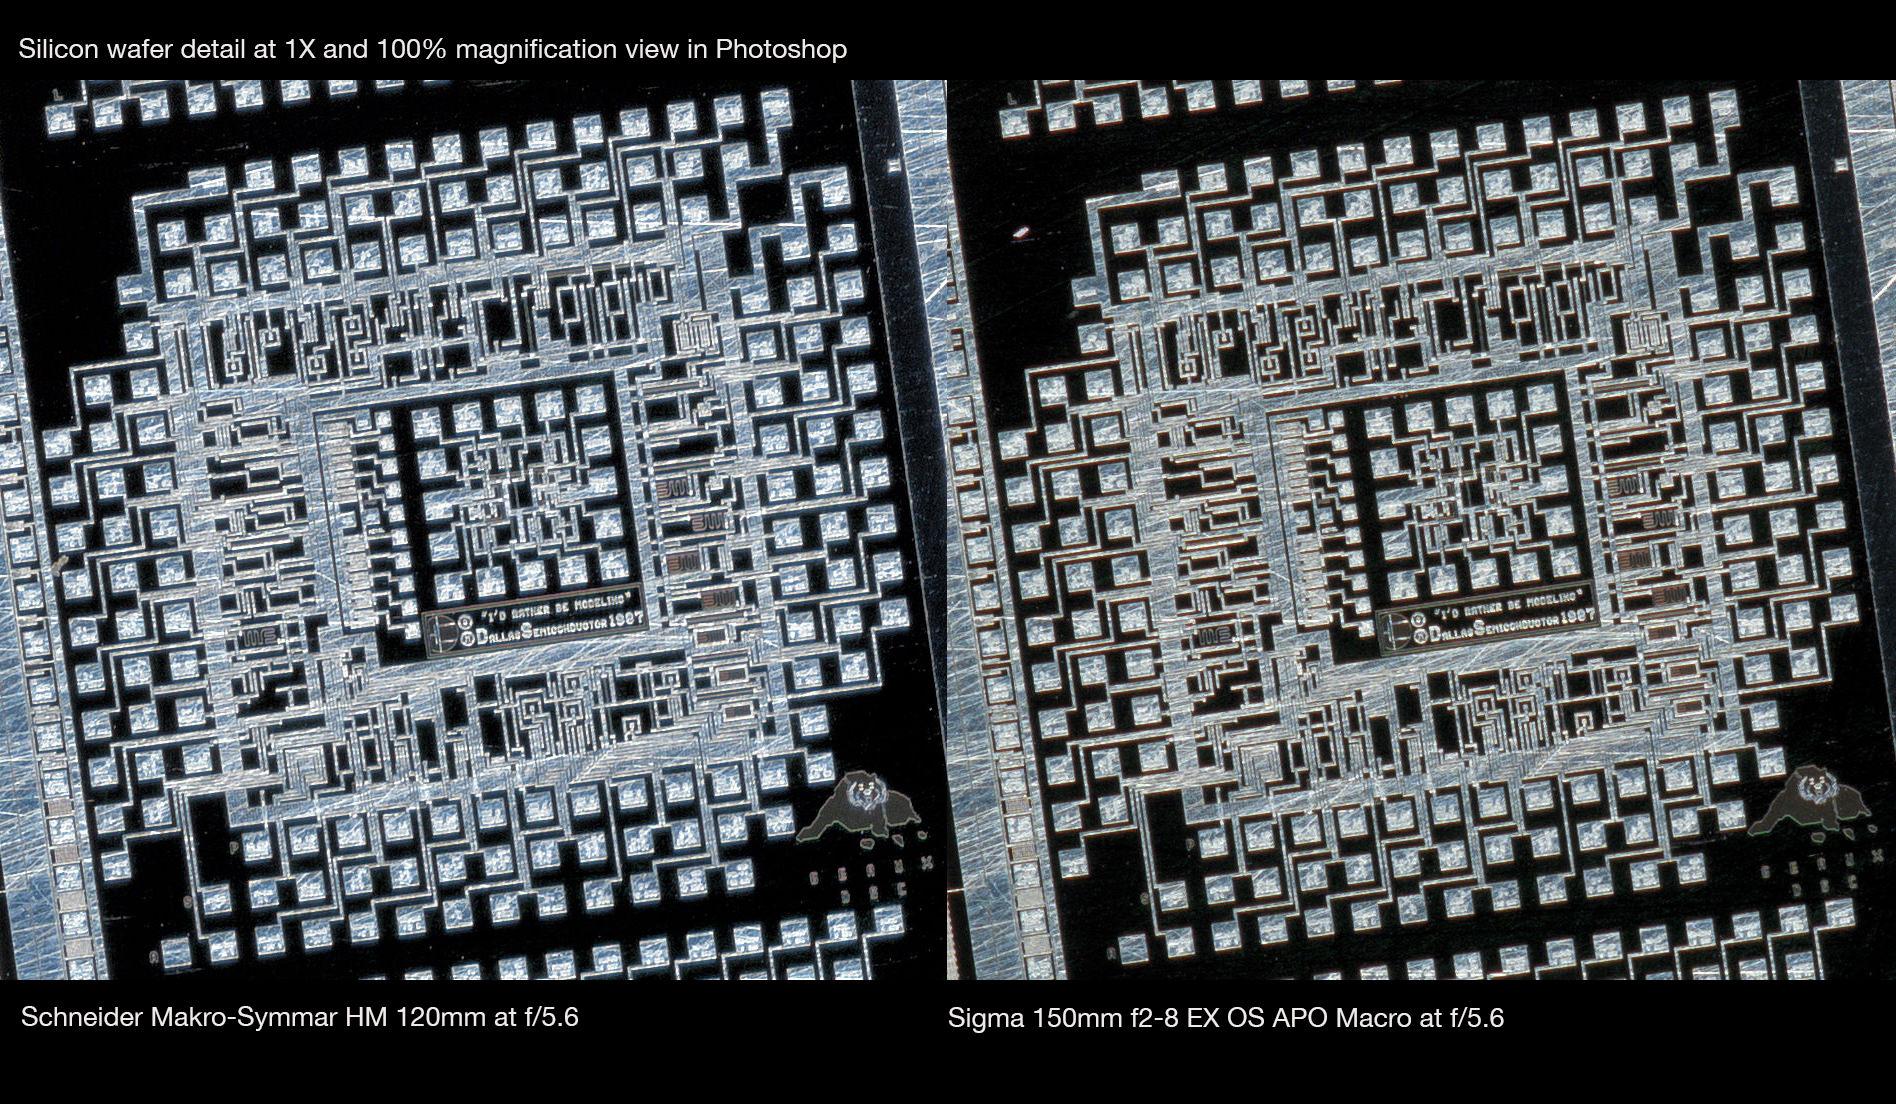 Schneider-Macro-Symmar-HM-120mm-vs-Sigma-150-Macro-at-1X-center-crop-Robert-OToole-Photography.JPG